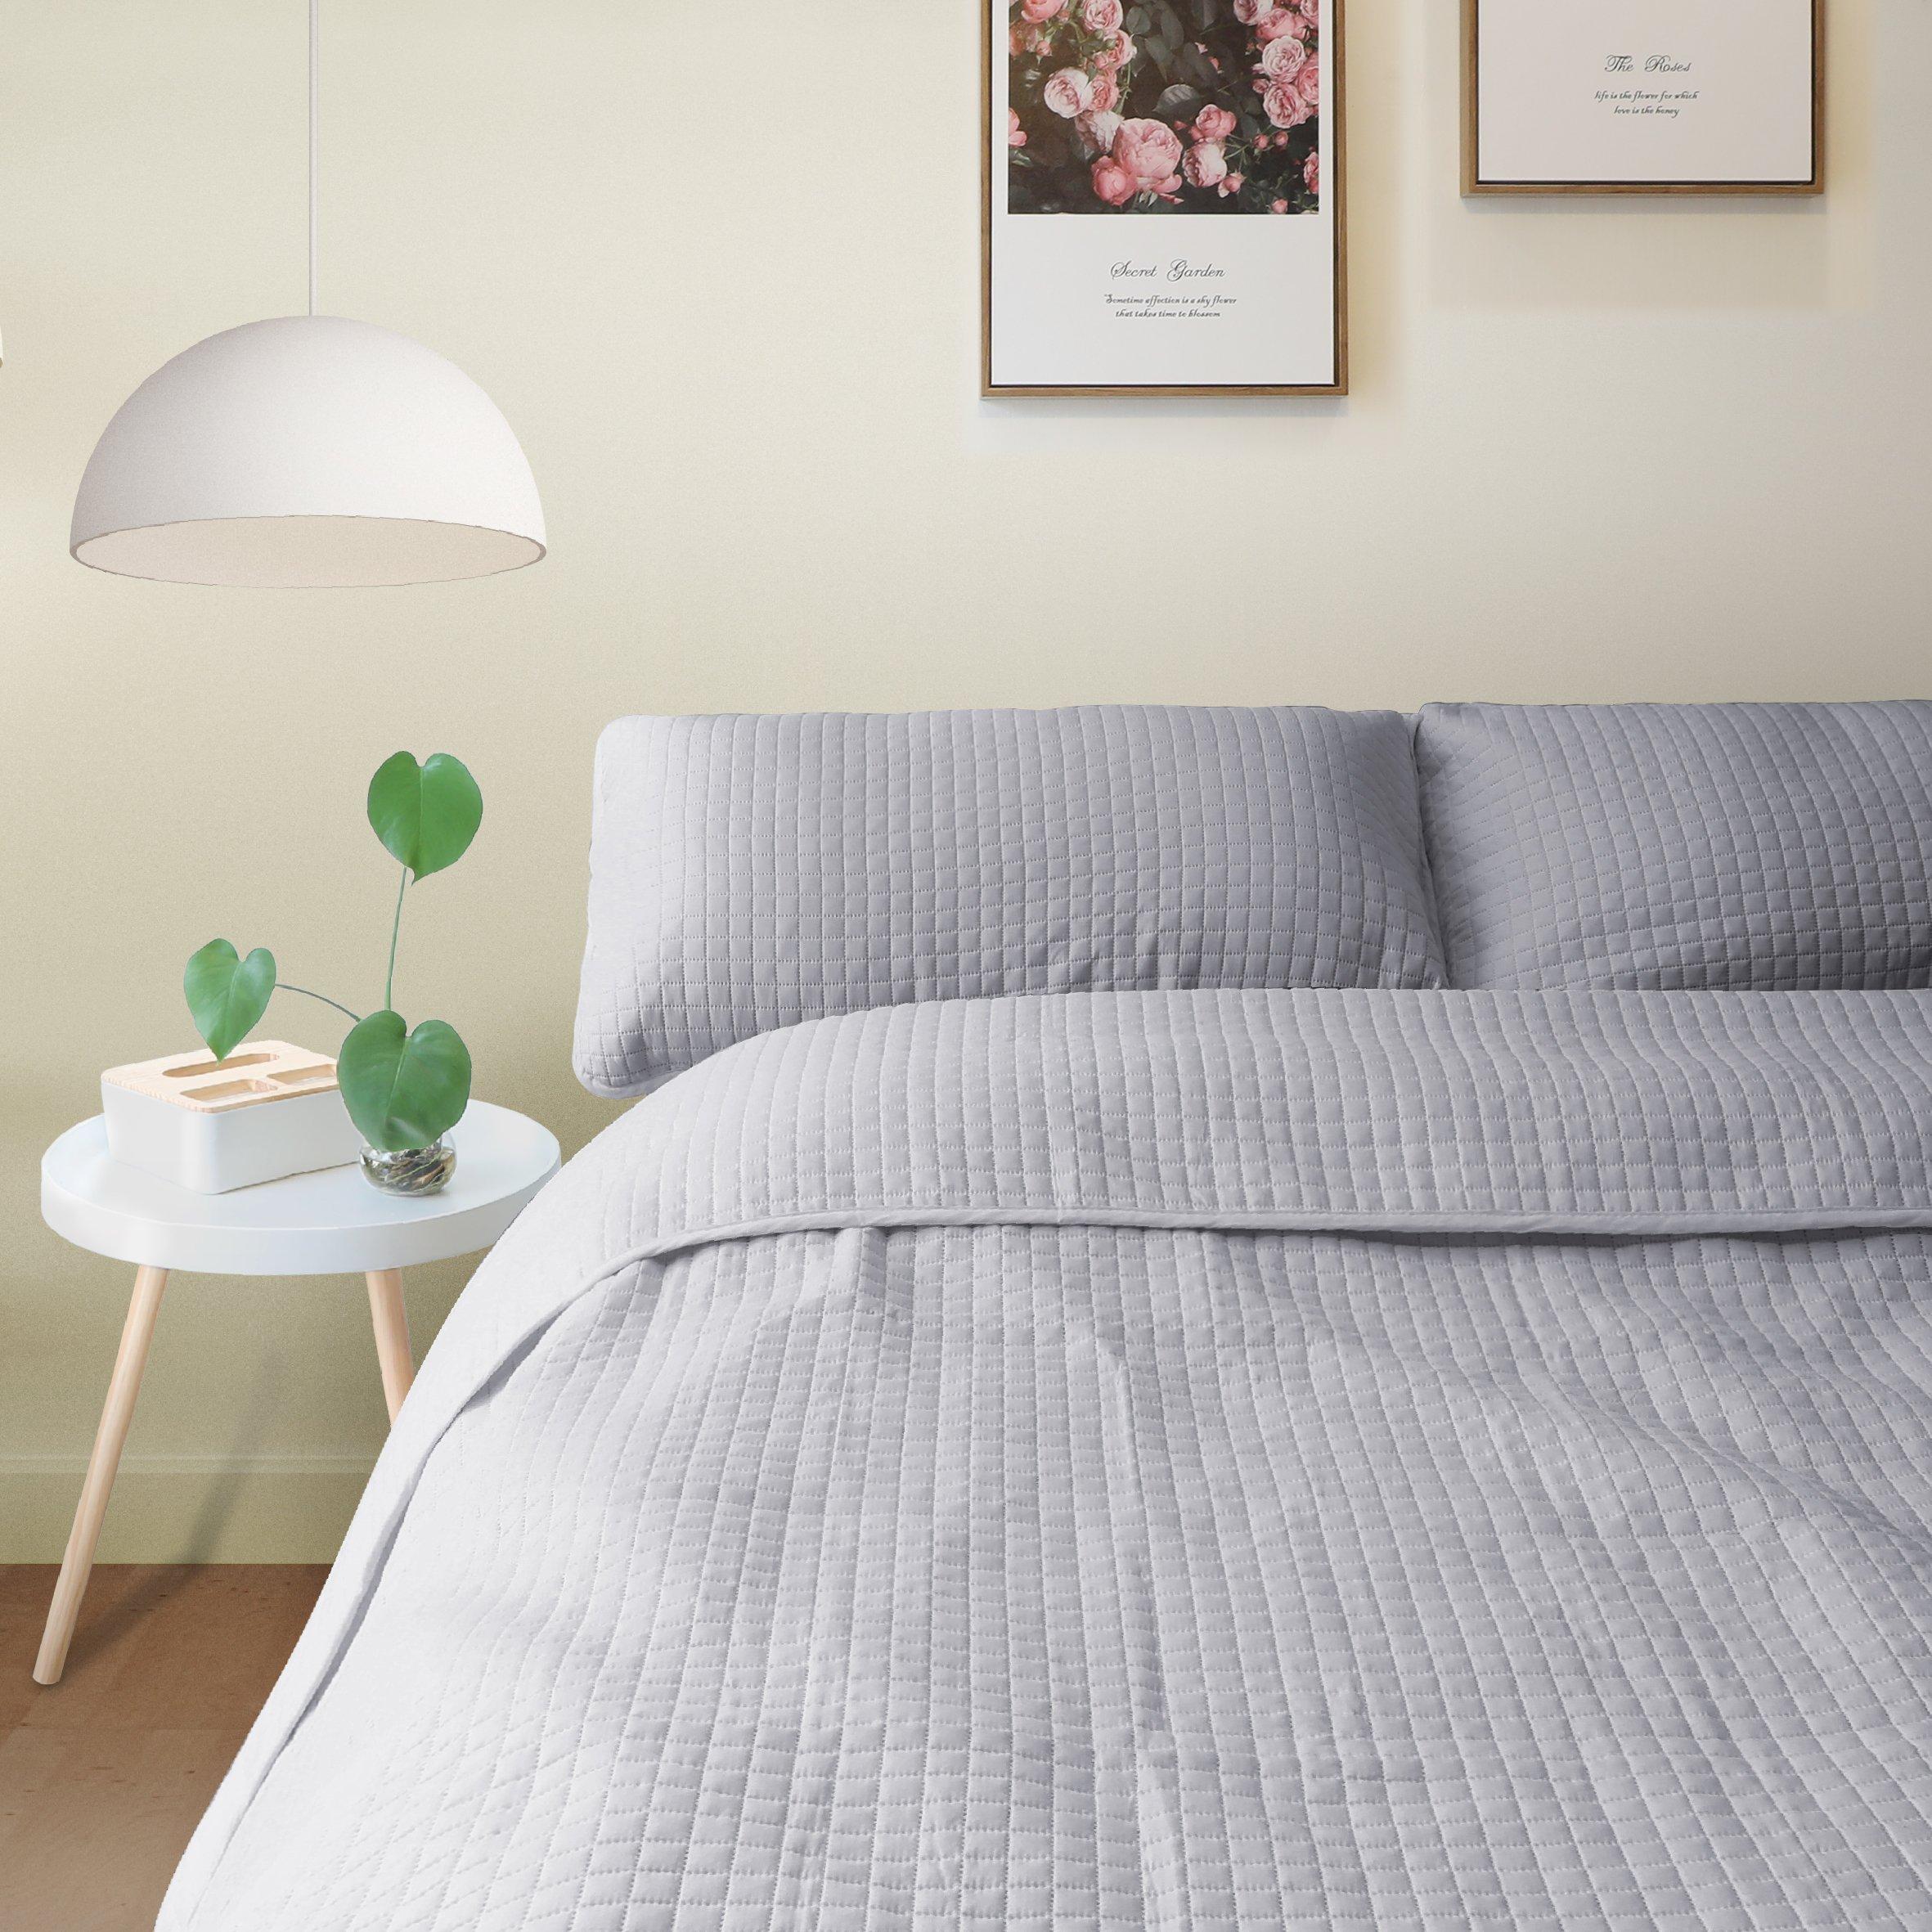 ALPHA HOME 3-Piece Bedspread Set Queen Size Bed Quilt Set Summer Blanket, Grey, Includes 1 Quilt, 2 Shams